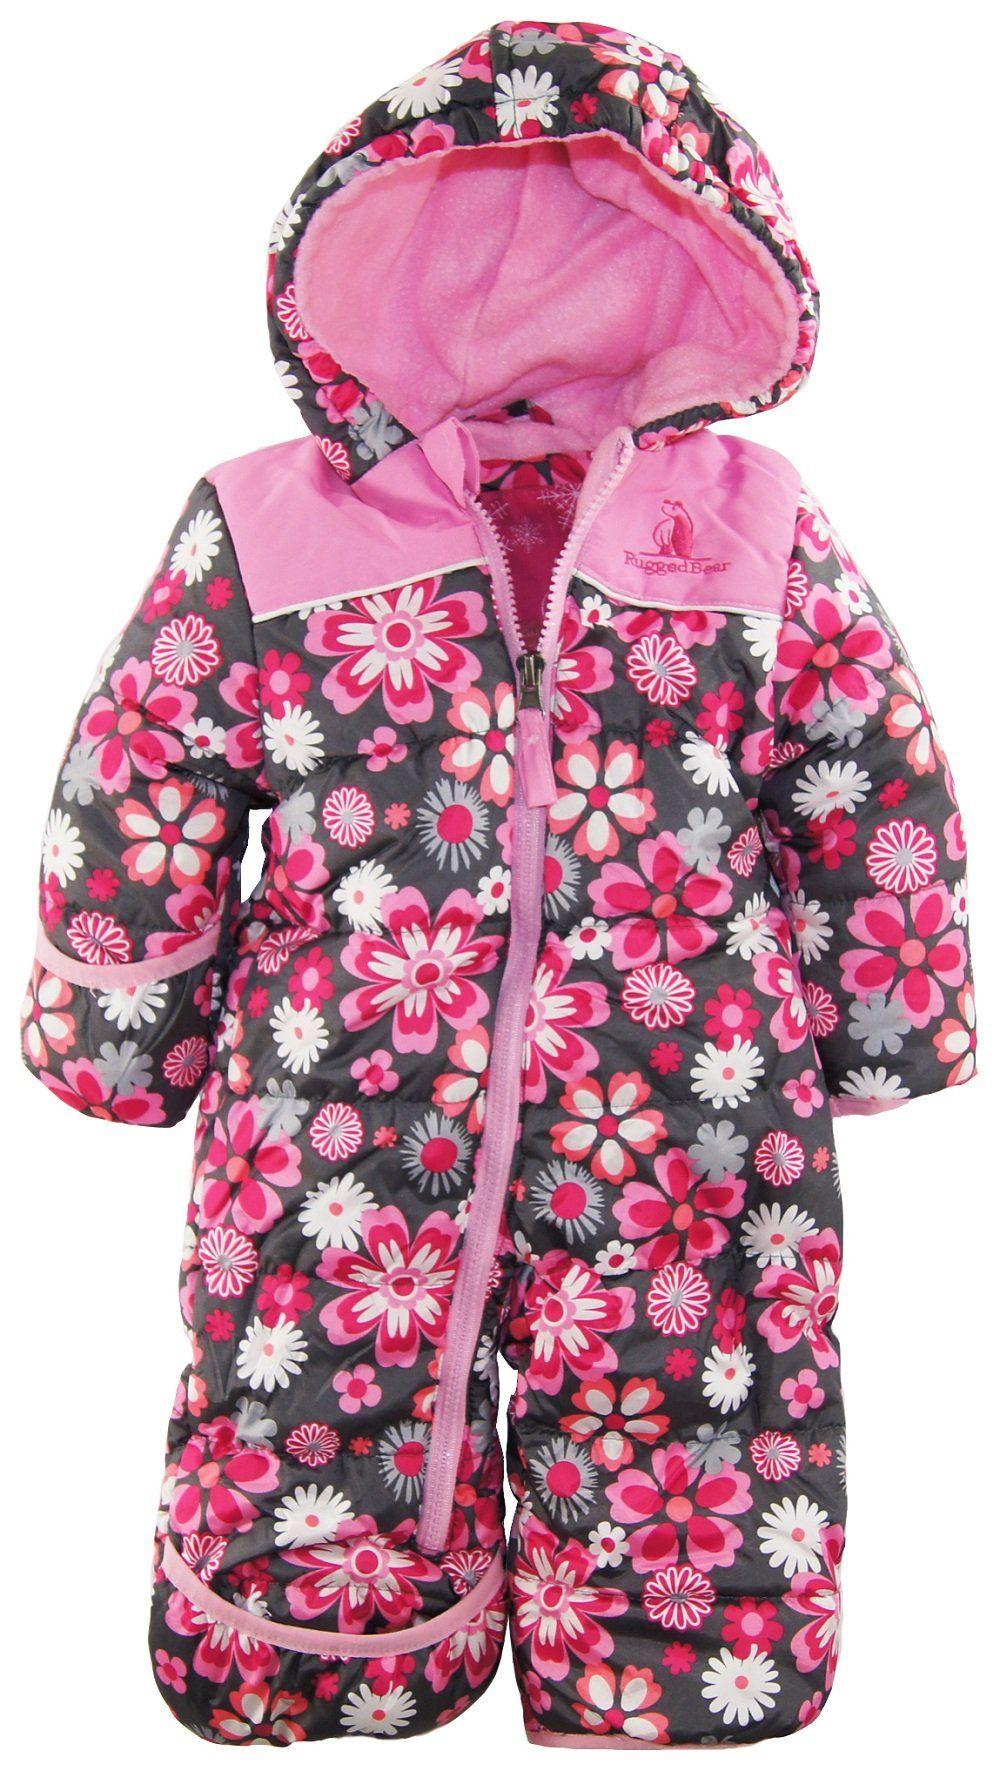 0347949f8936 Rugged Bear Baby Girls Newborn Floral One Piece Snowsuit Pram ...